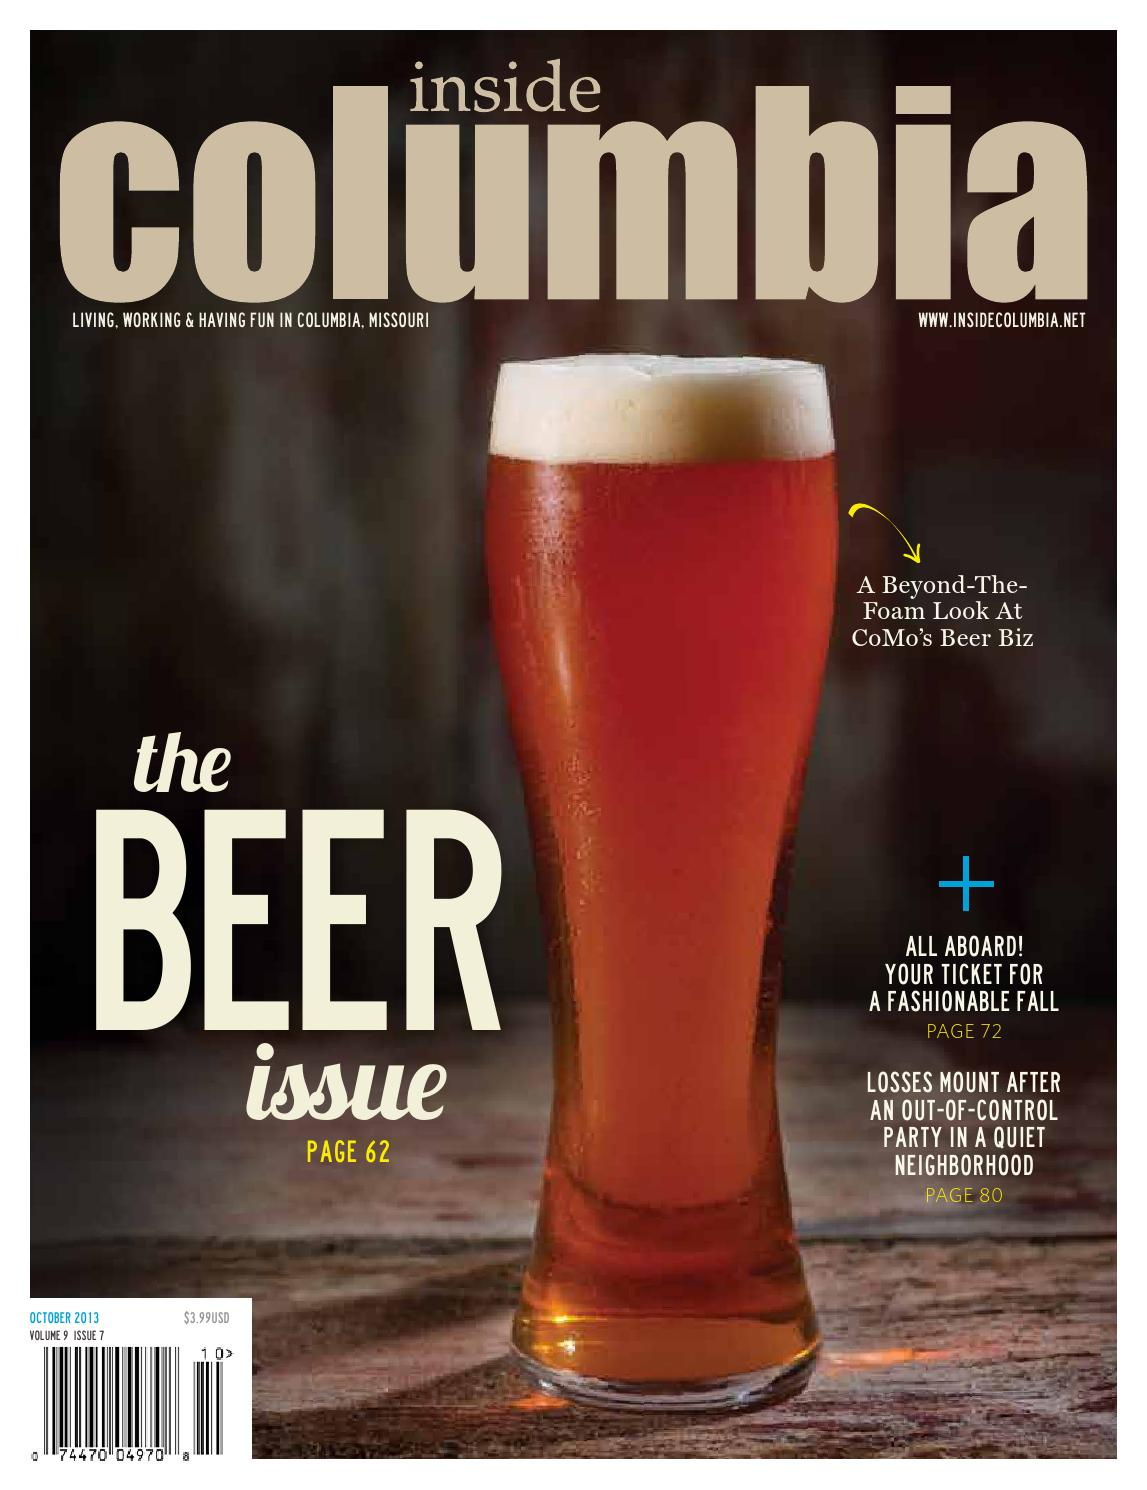 inside columbia october 2013inside columbia magazine - issuu